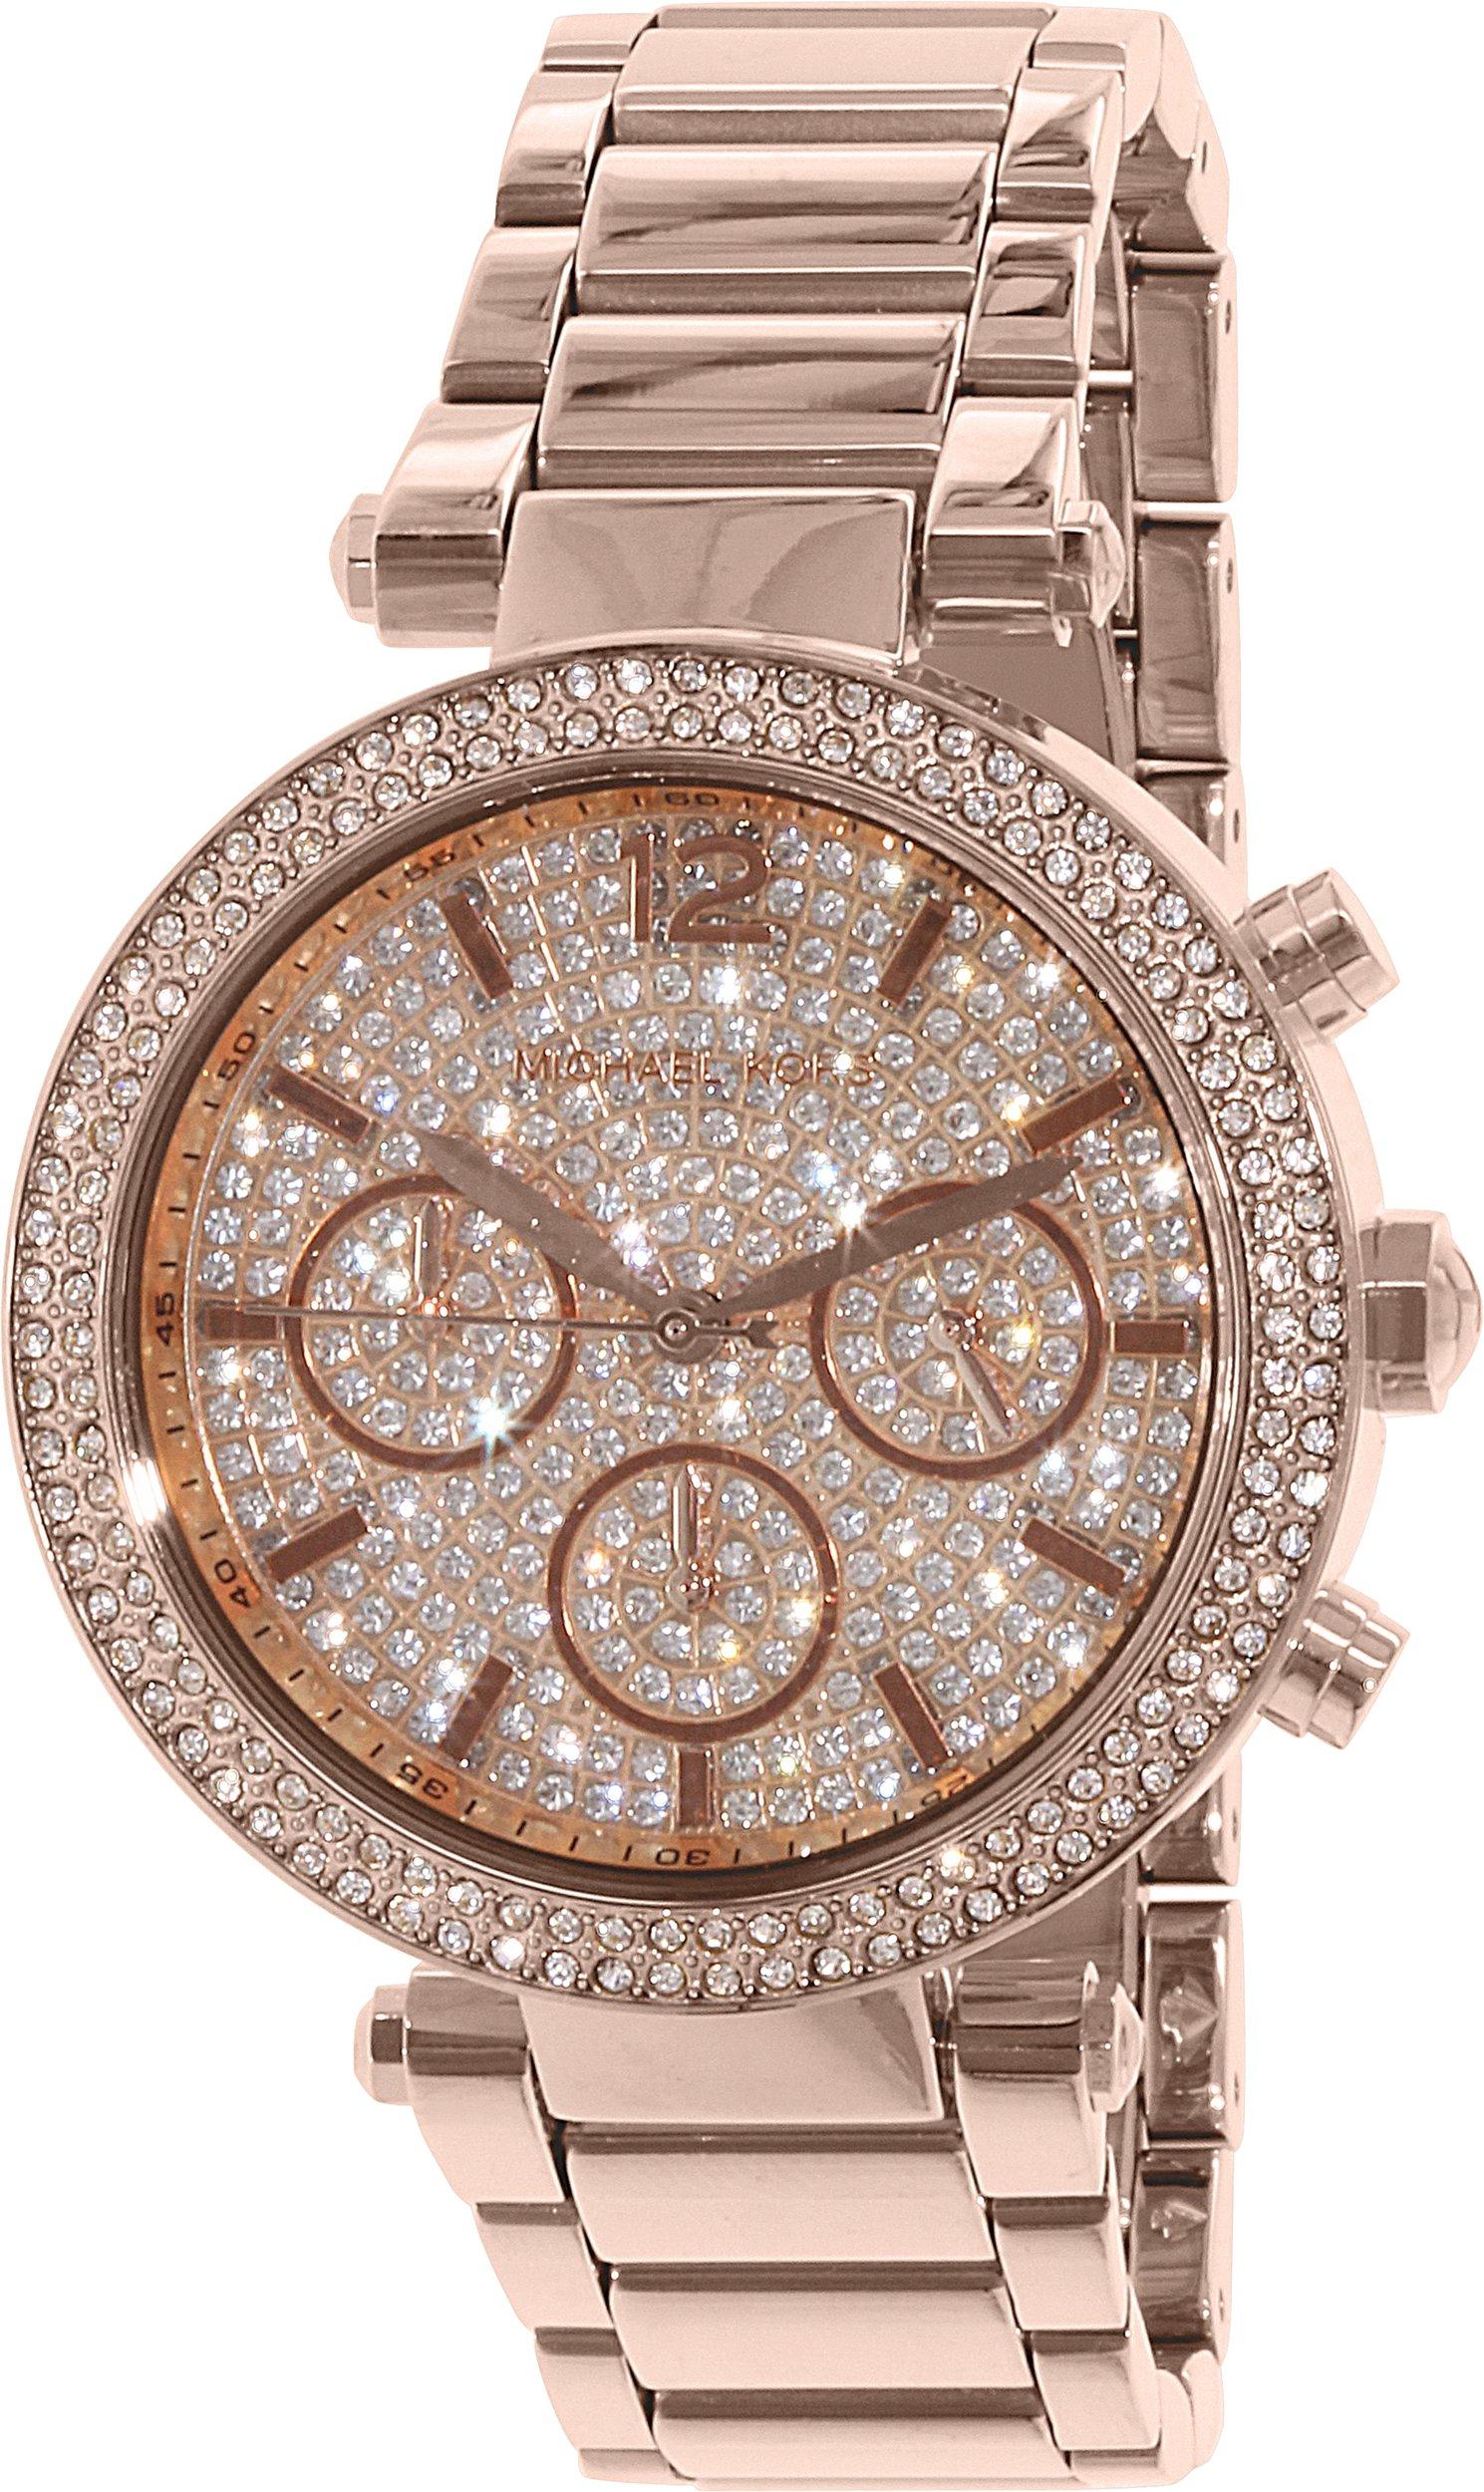 Michael Kors Parker Rose Gold Stainless Steel Glitz Dial Women's Chronograph Watch MK5857